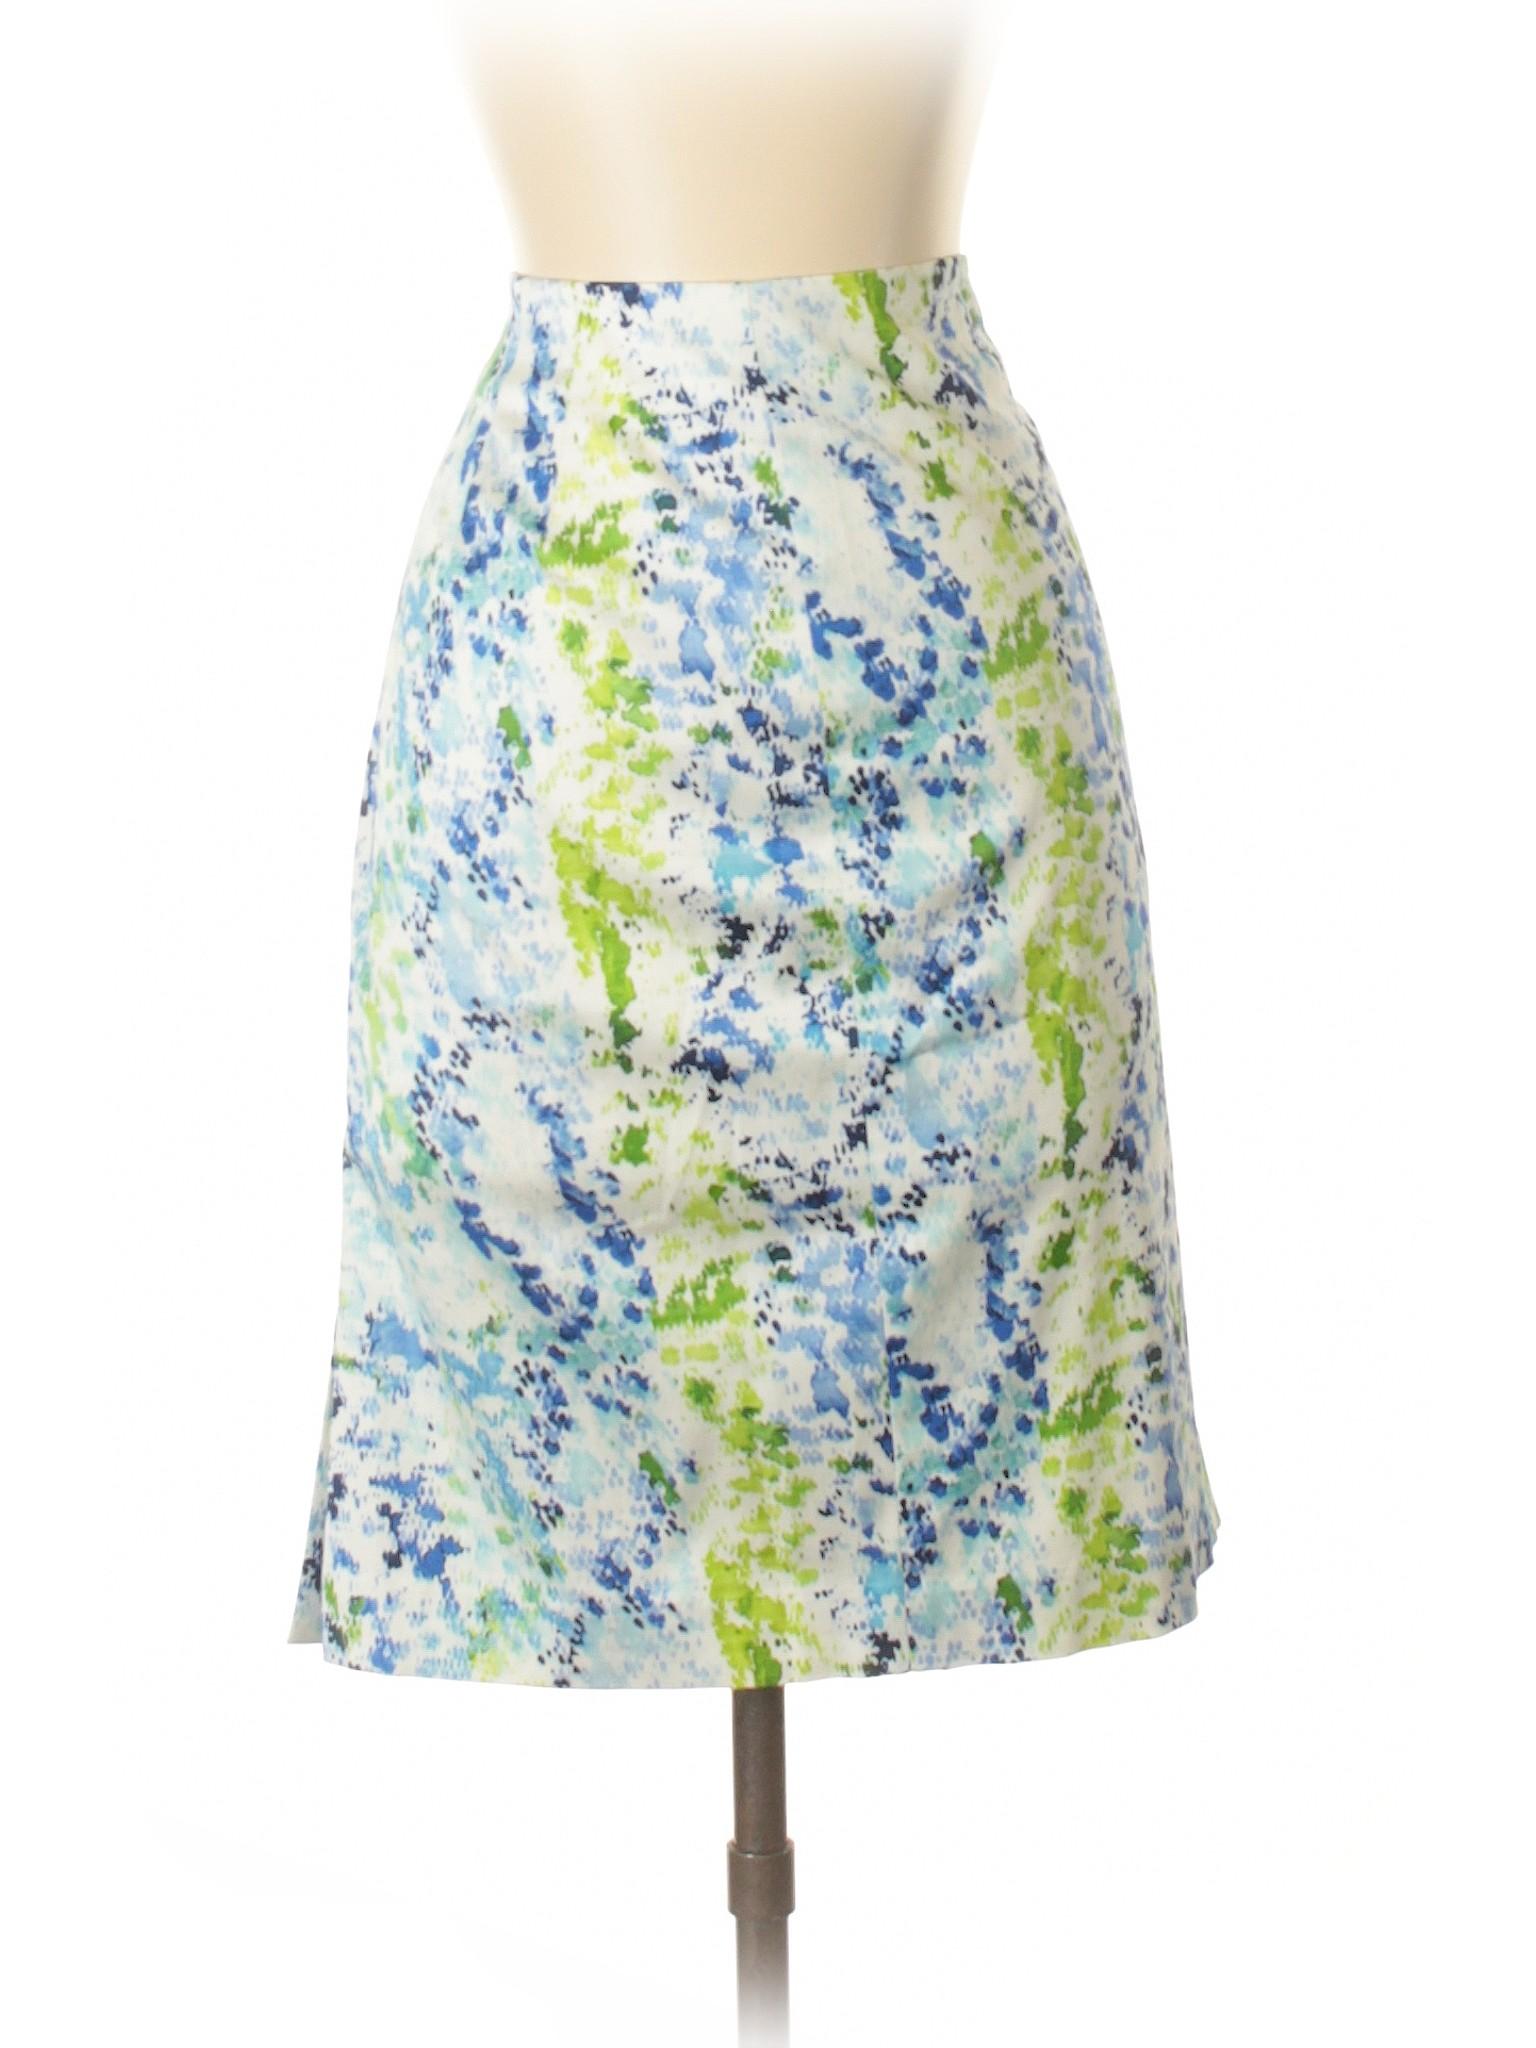 Boutique Casual Skirt Casual Boutique Skirt Boutique zSqwSTZa